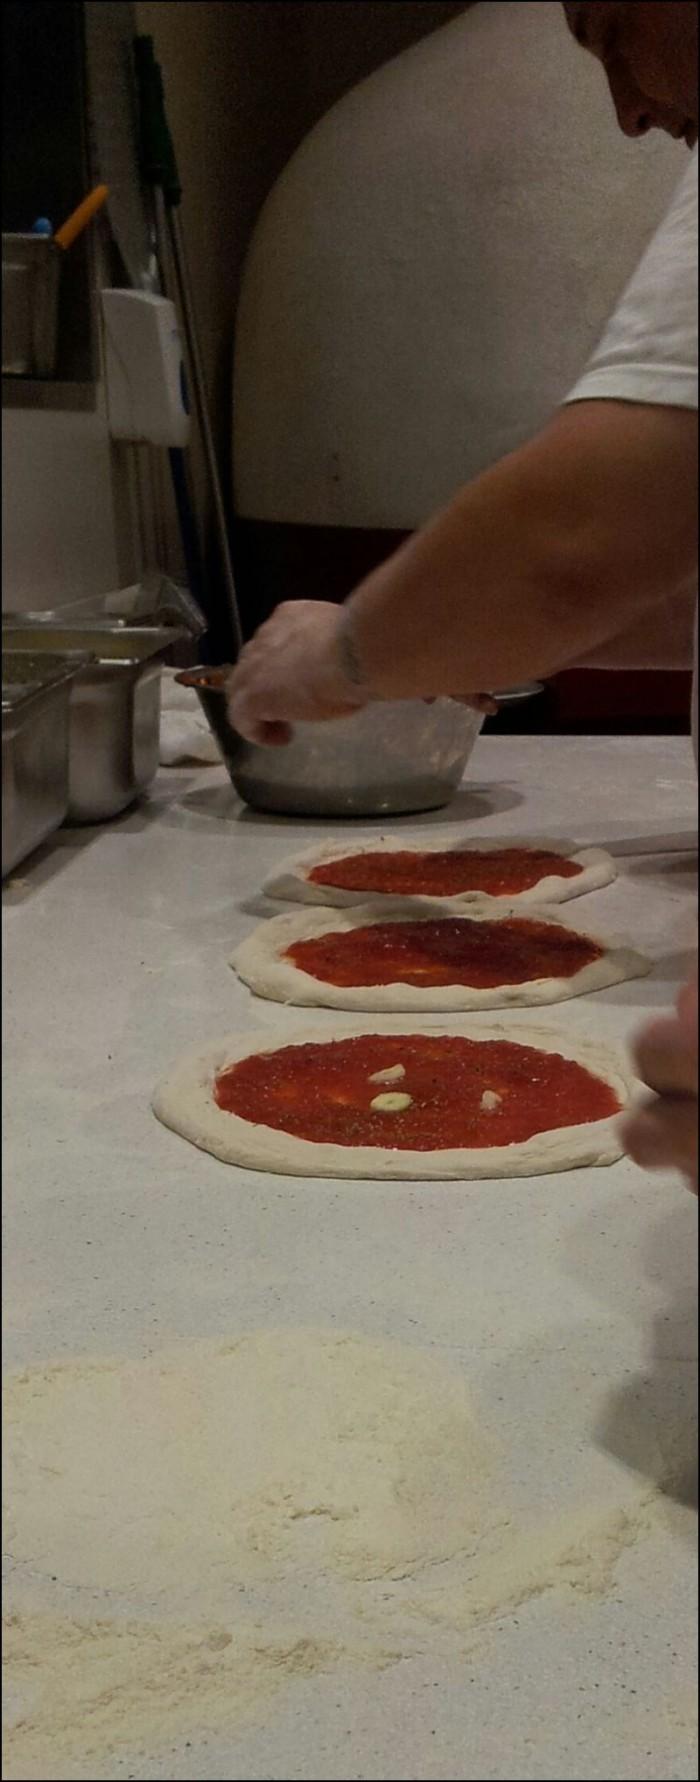 Martucci Masanielli Firenze pizza marinara fratelli cuore